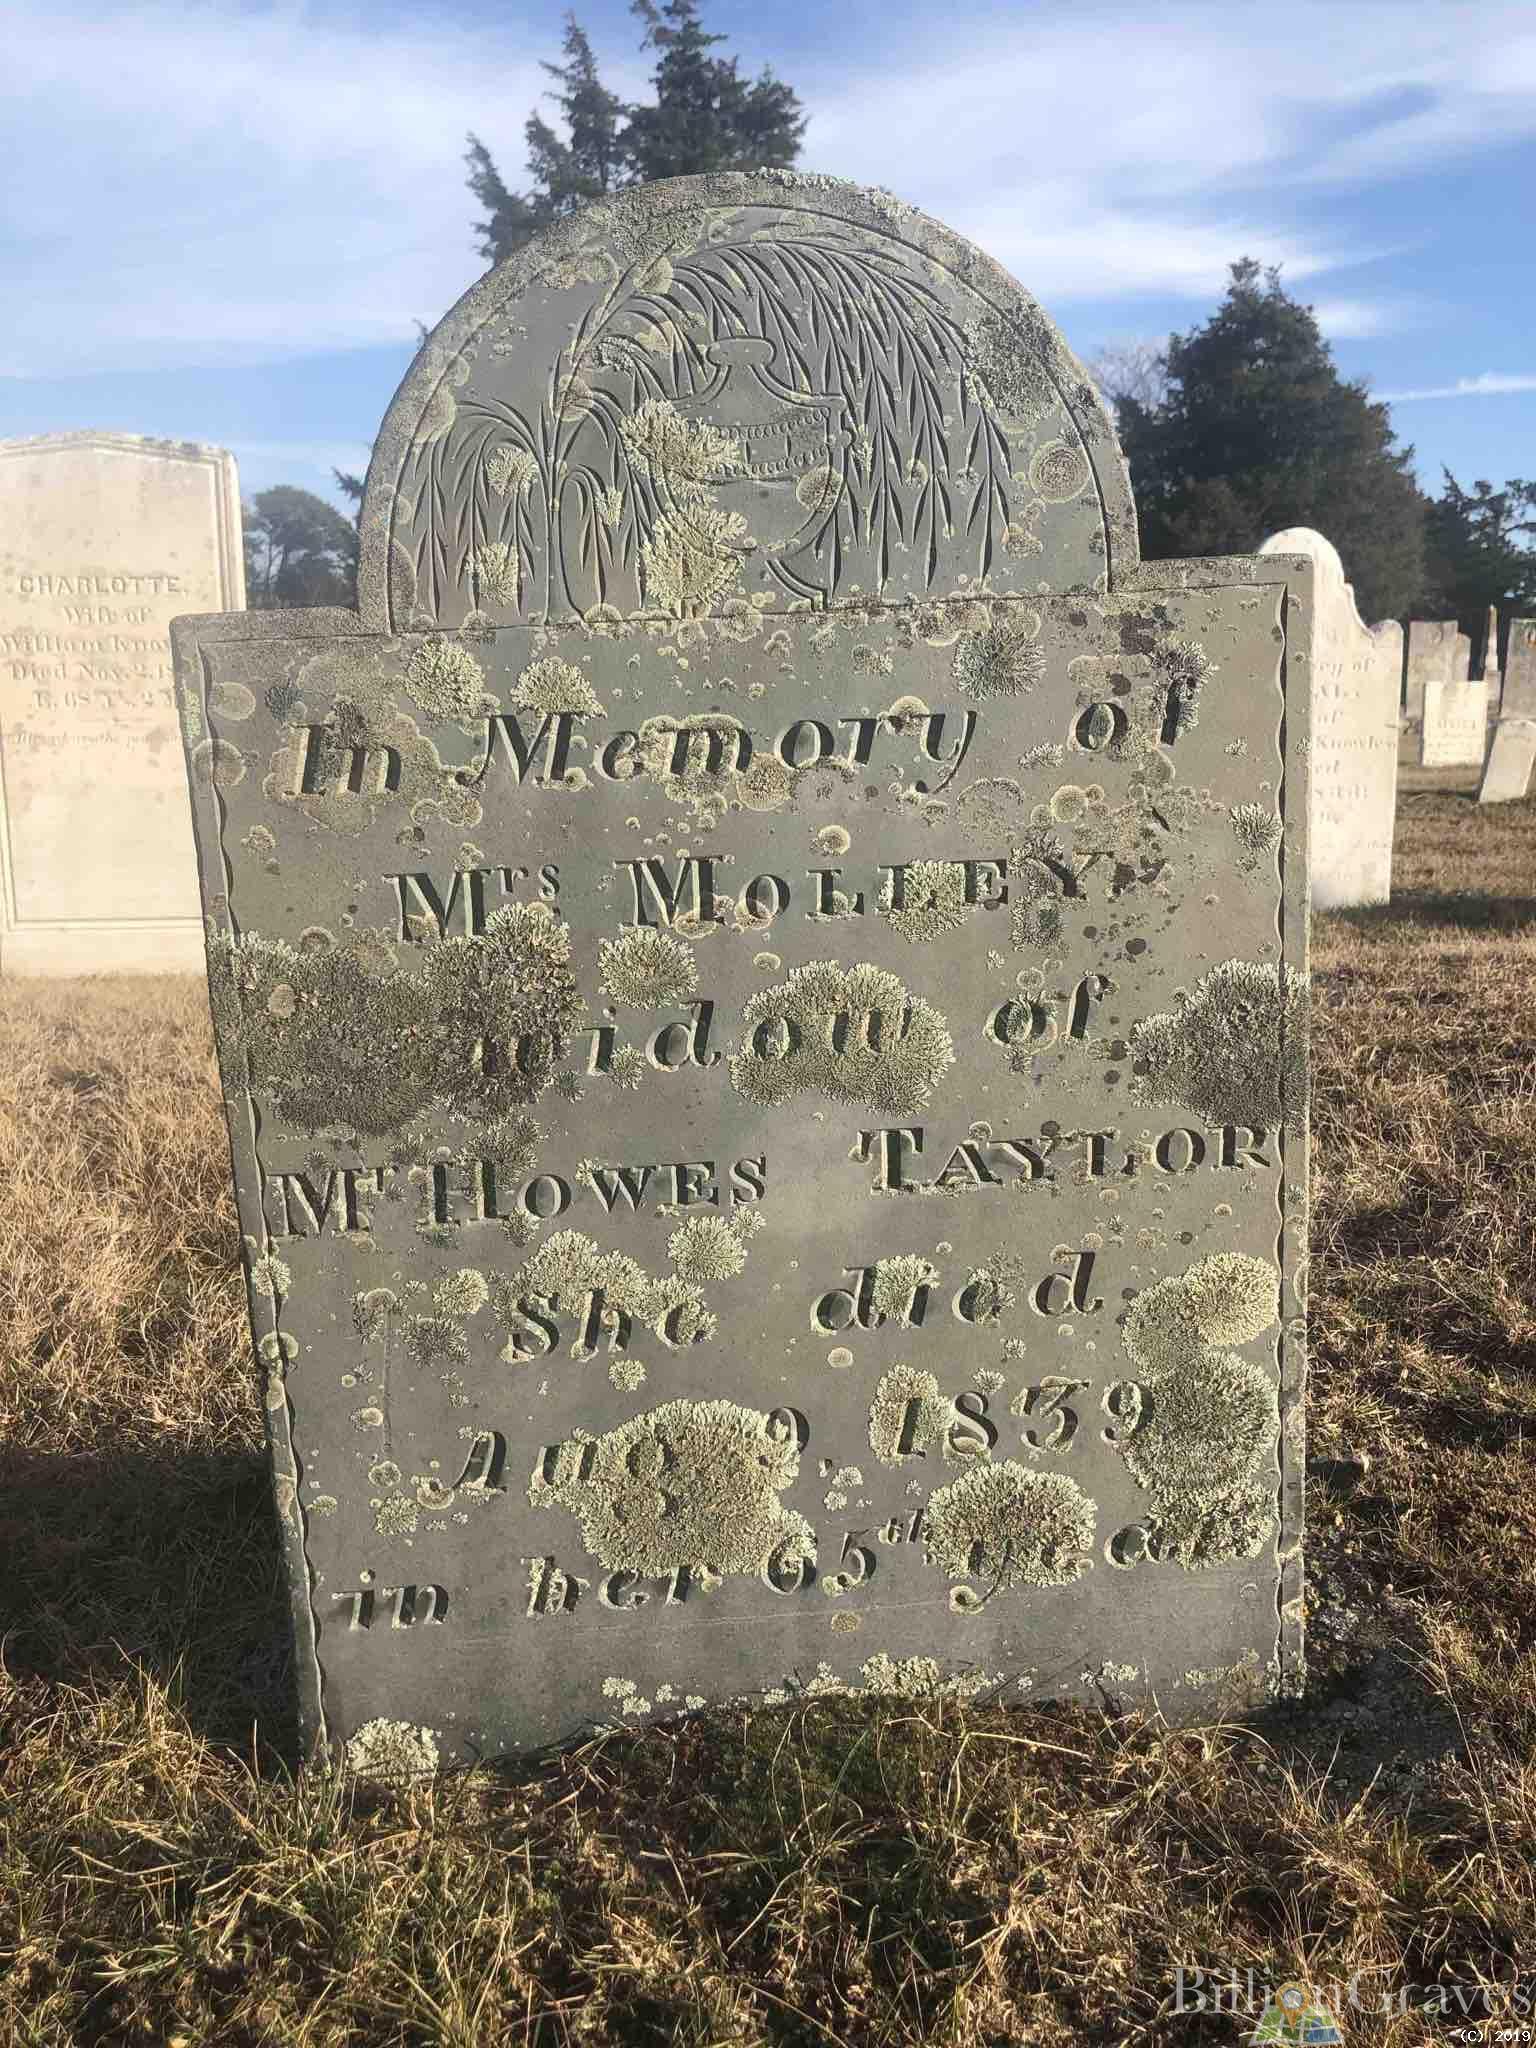 BillionGraves, gravestone, grave, damaged gravestones, cemetery, family history, ancestors, community service project, JustServe, BillionGraves app, ivy, plant growth, JustServe, lichen, mold